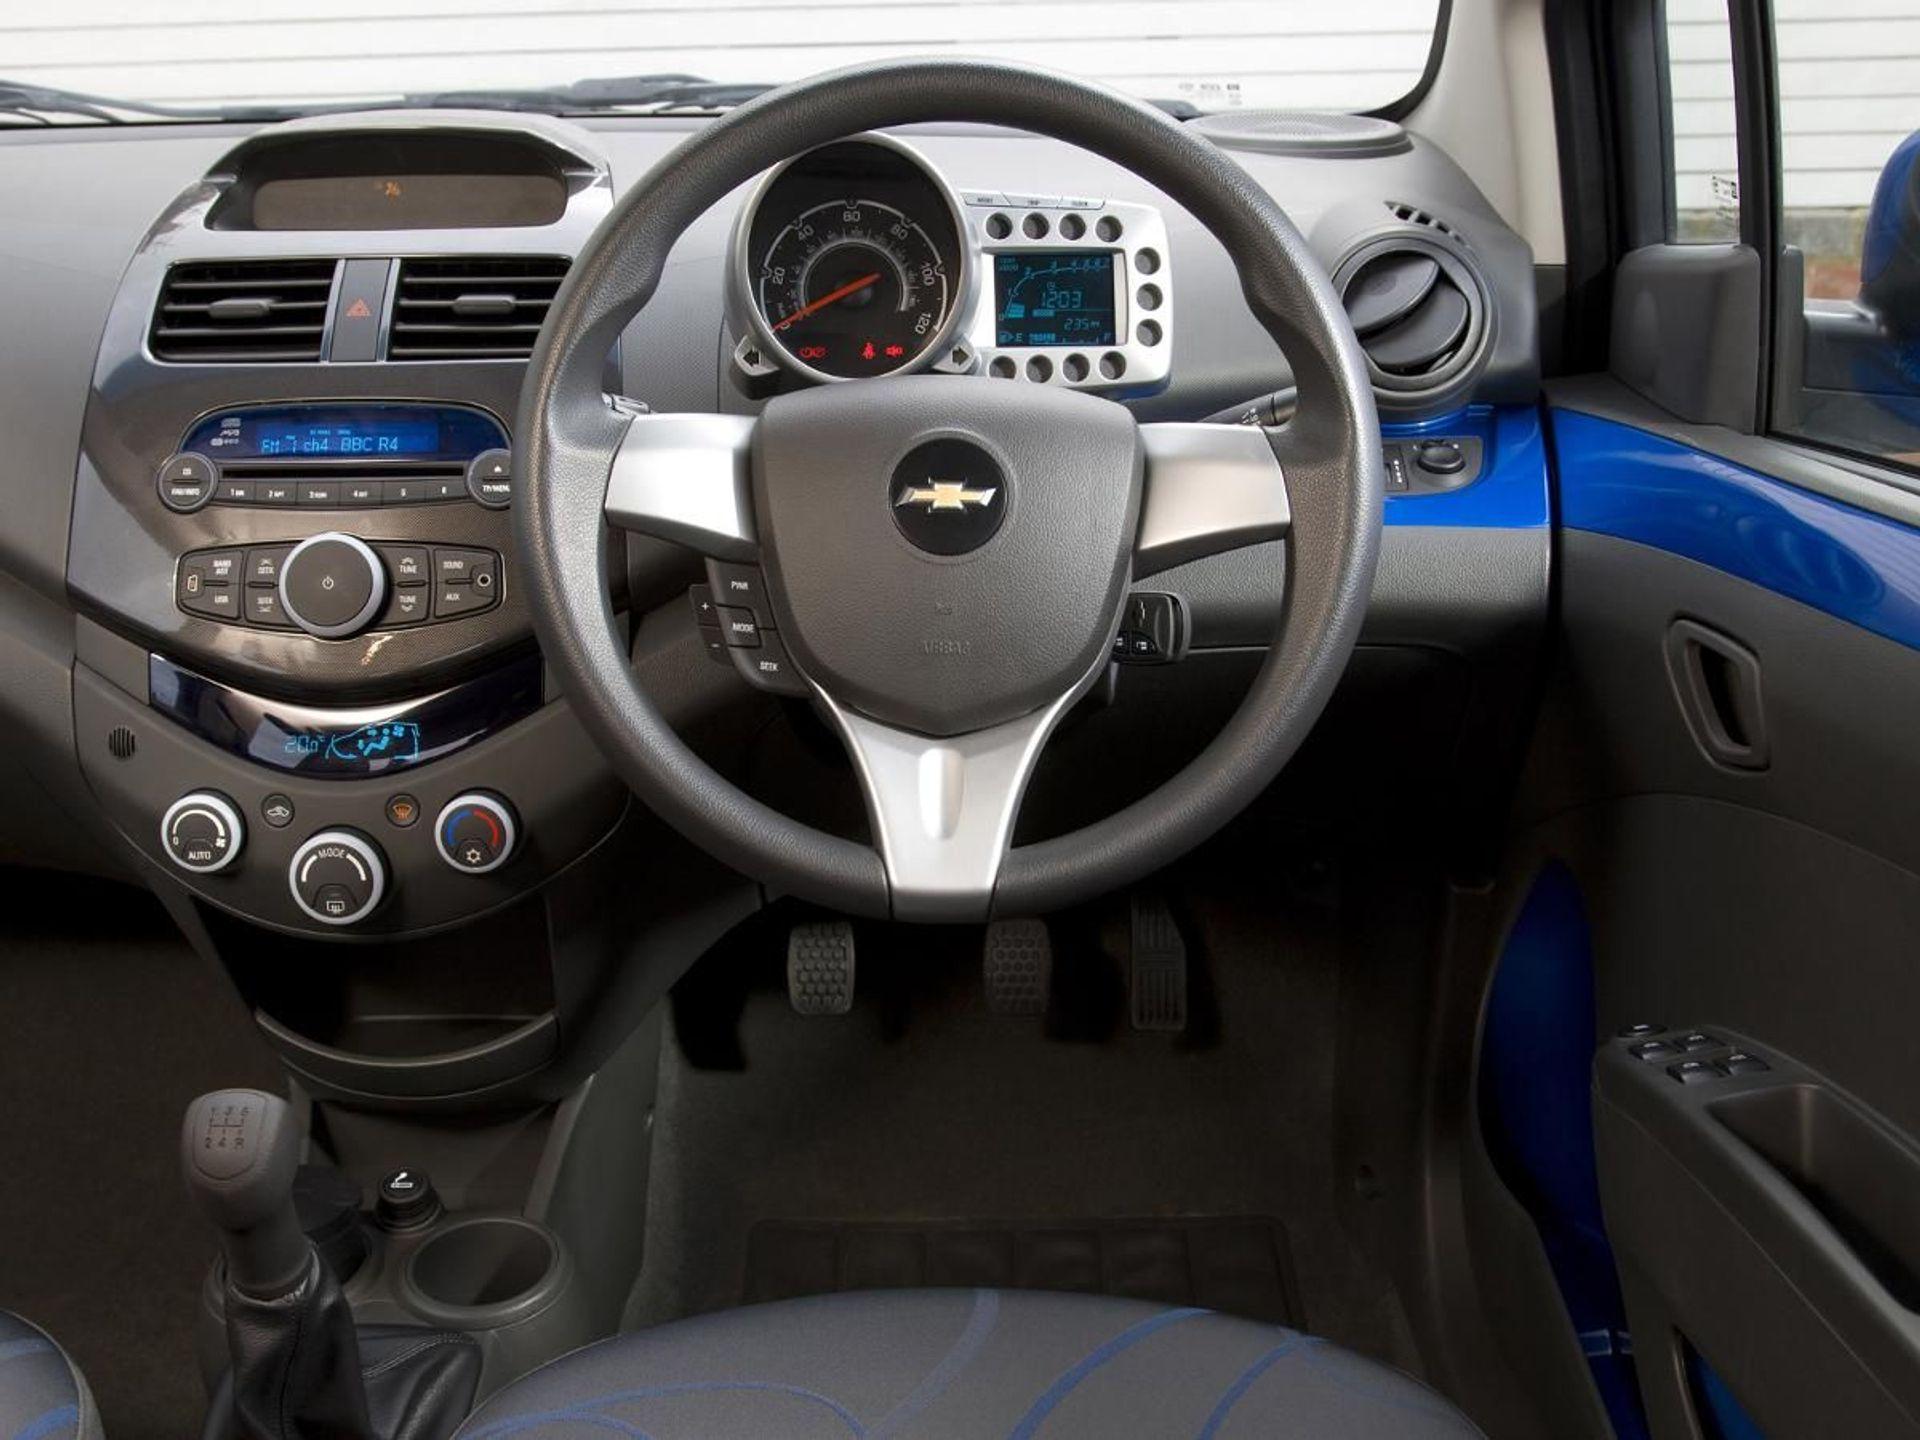 Chevrolet Spark LTZ image